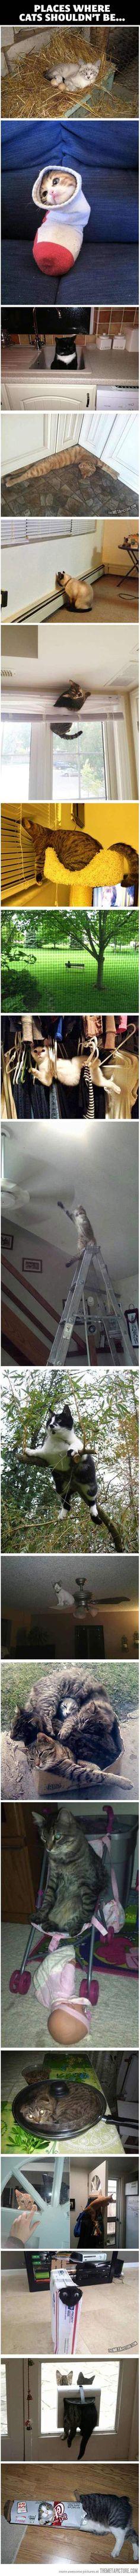 Places where cats shouldn't be…hahaha